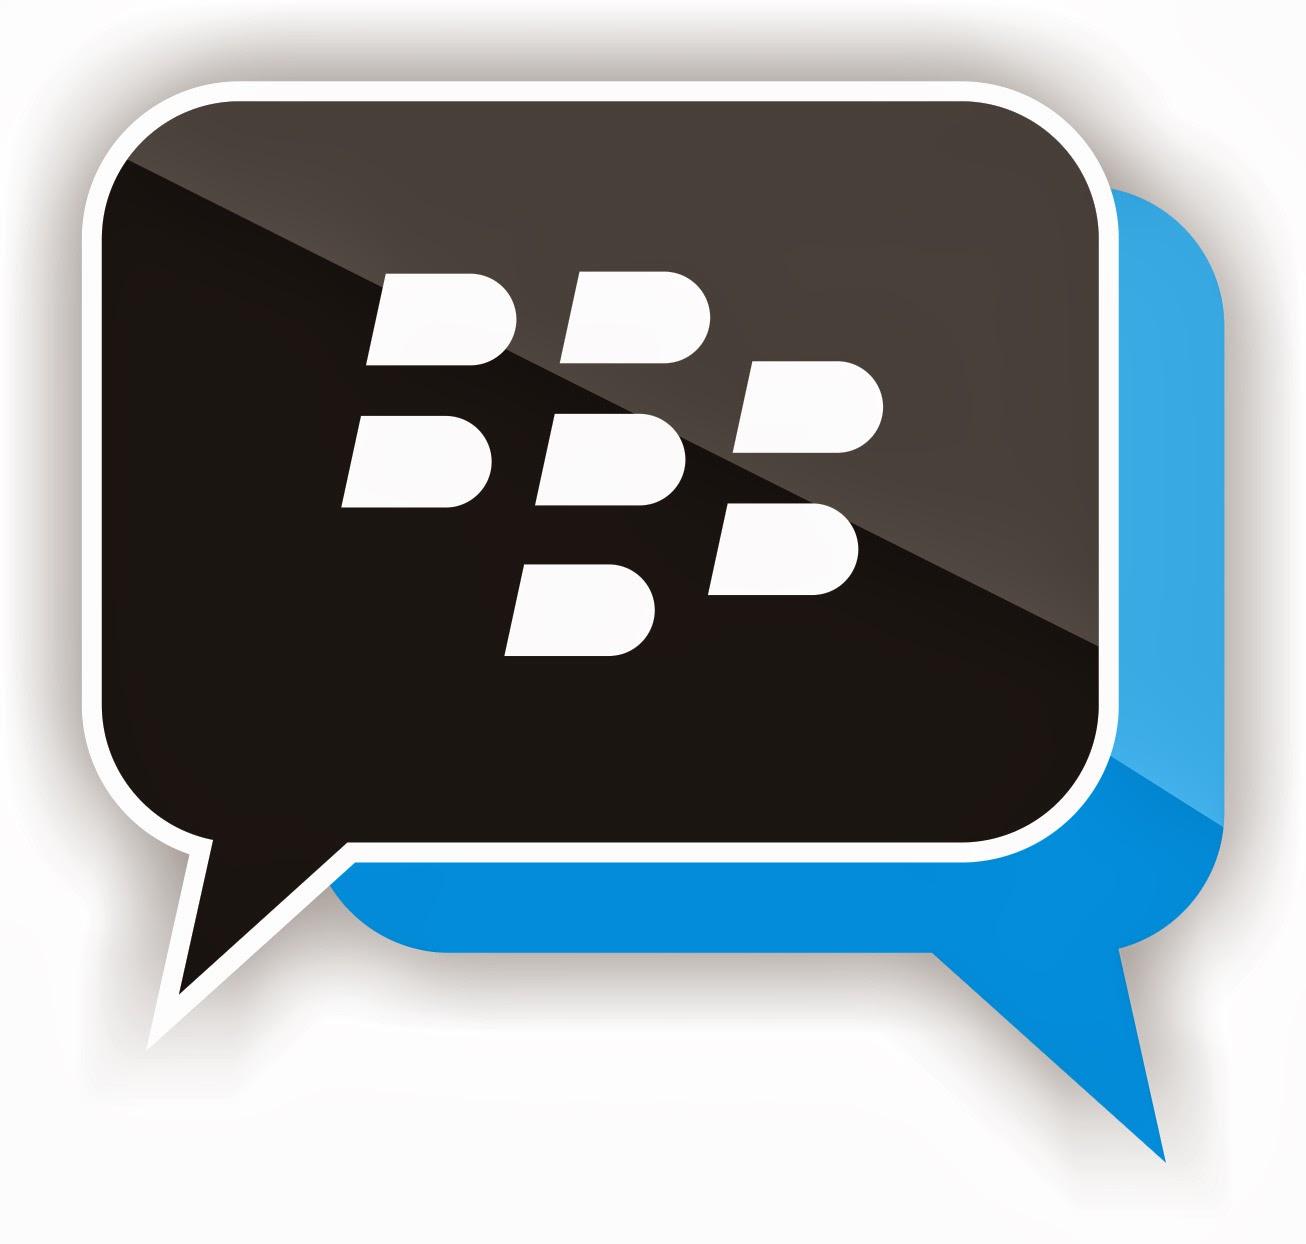 icon bbm logo format cdr download vector logo icon bbm icon.